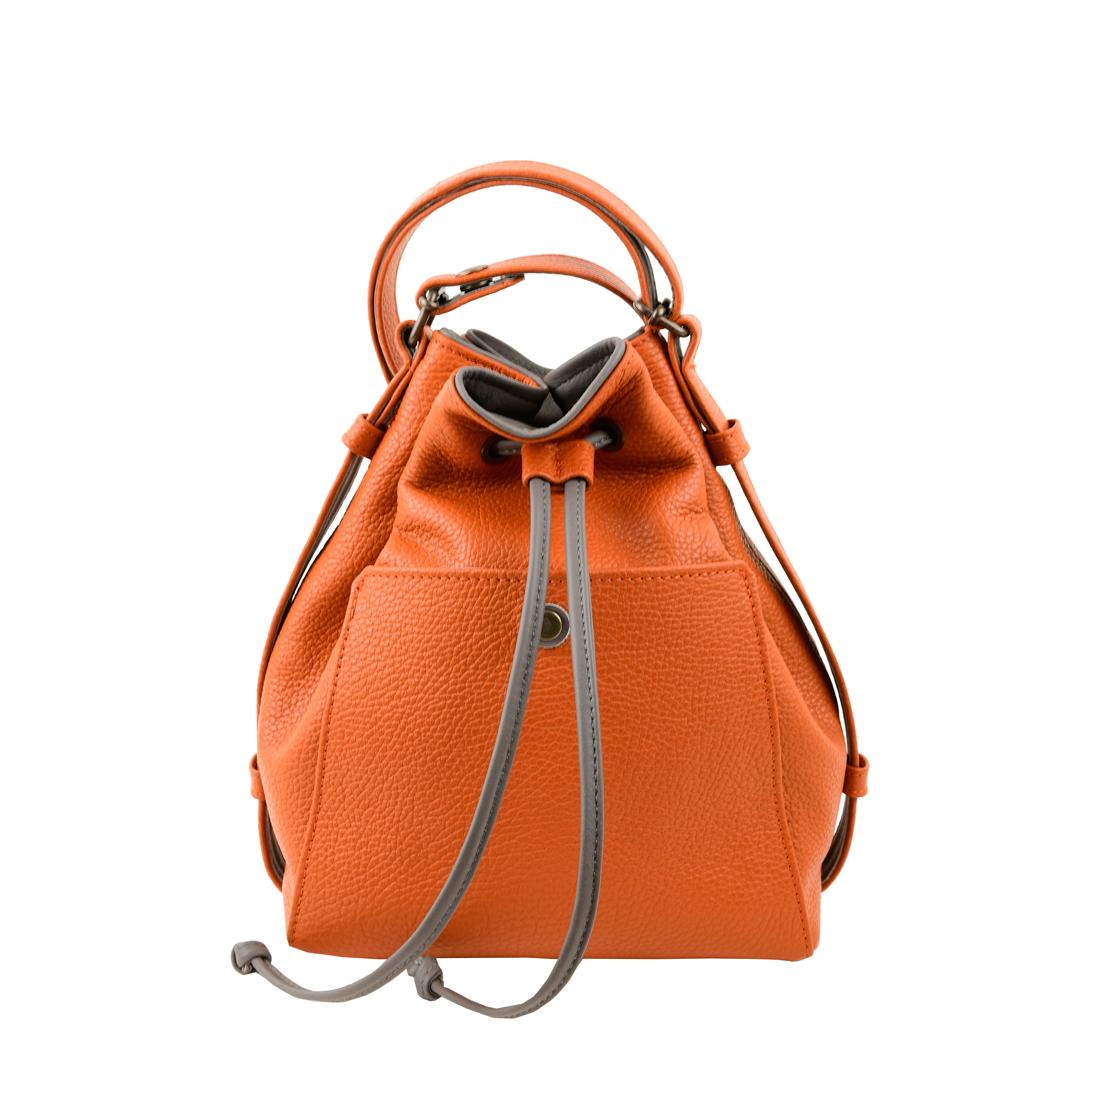 Jenny orange across body leather bag